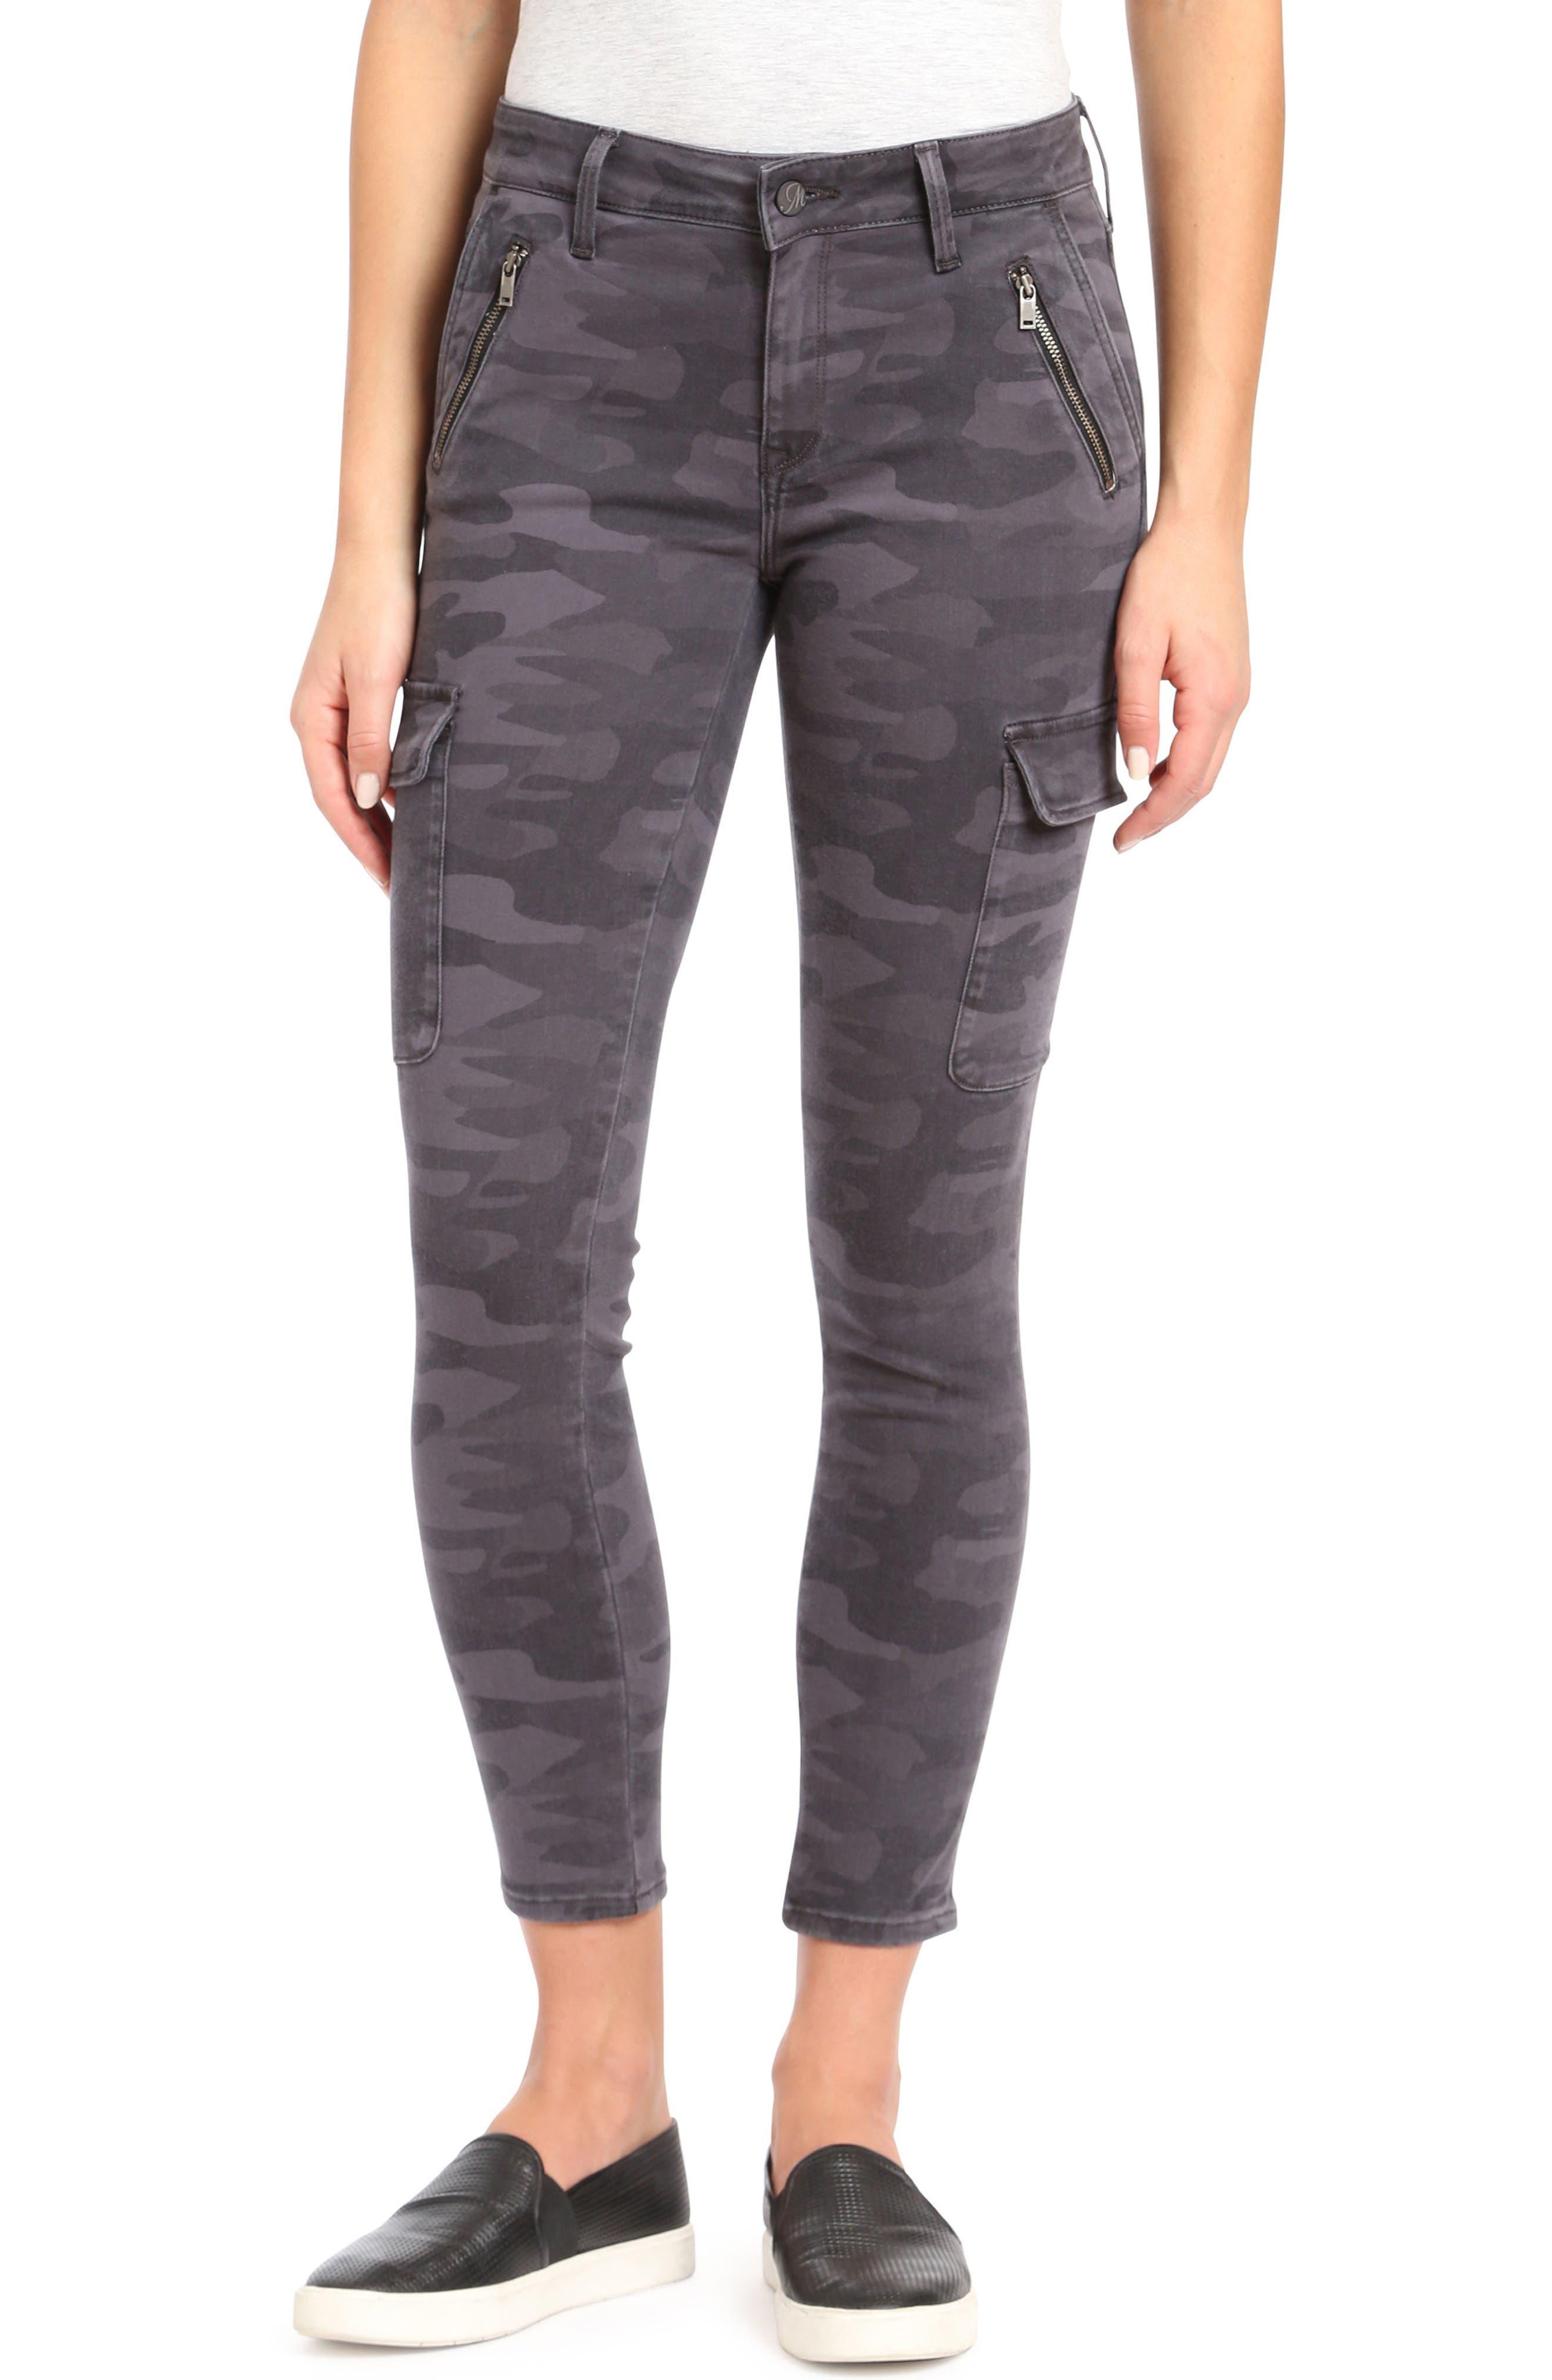 MAVI JEANS Juliette Camo Skinny Cargo Pants, Main, color, SMOKE CAMO